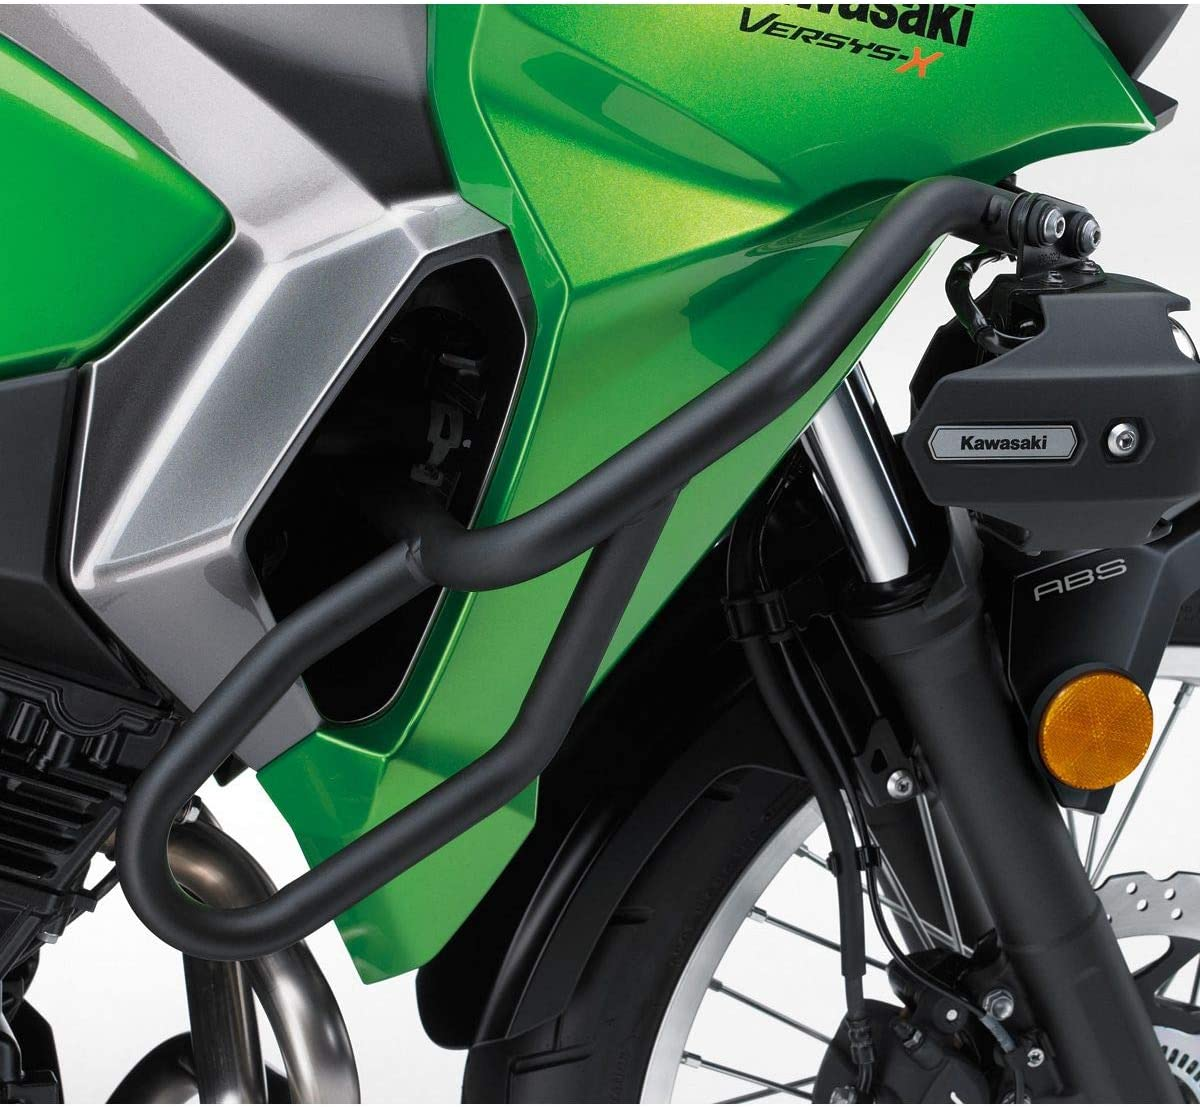 Genuine Kawasaki Accessories Engine Guard (Black) for 17-19 Kawasaki KLE300